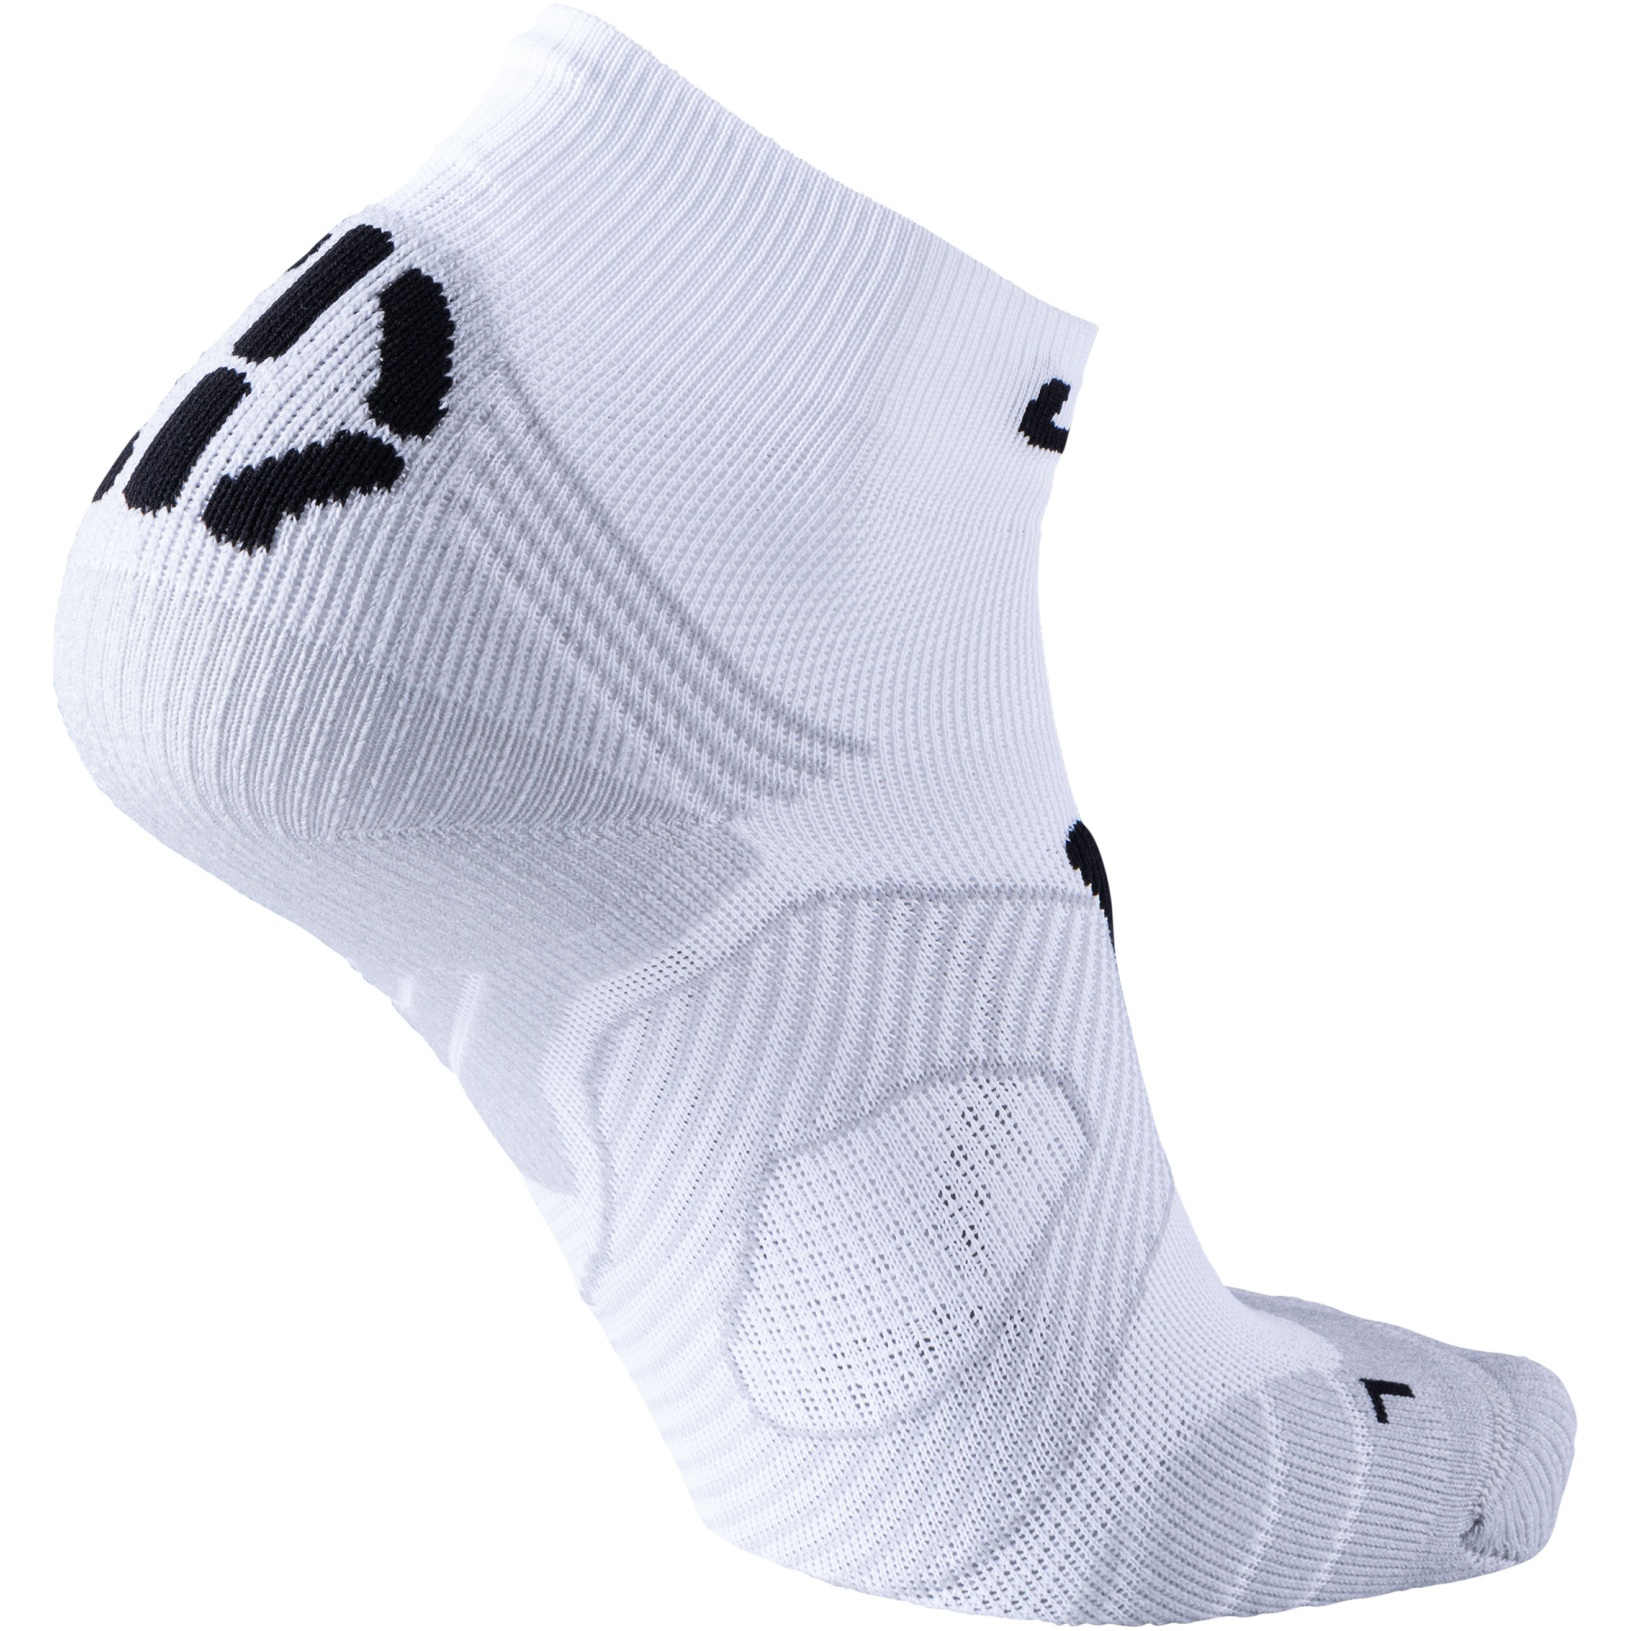 Image of UYN Lady Running Super Fast Socks - White/Black